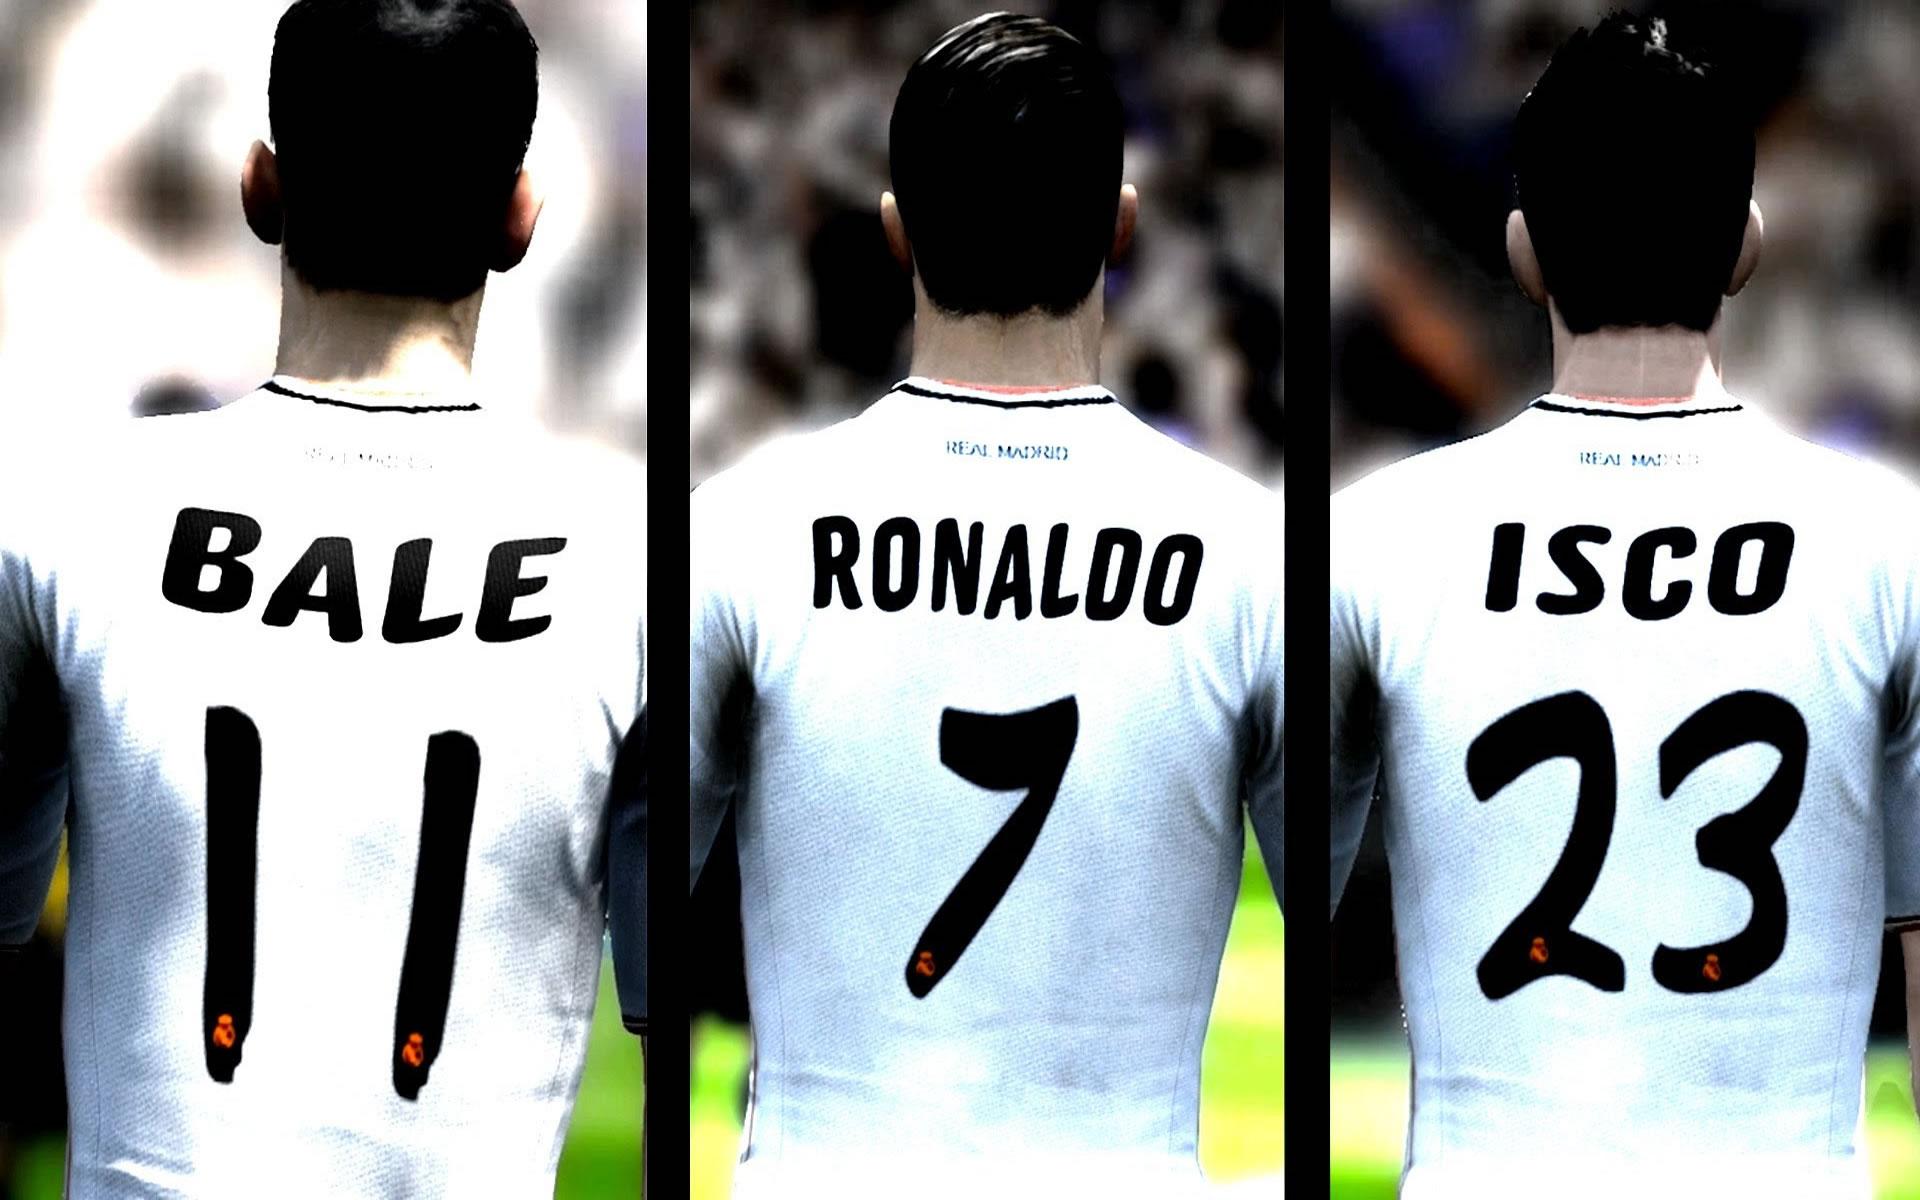 Craks Real Madrid Bale, Isco y Ronaldo